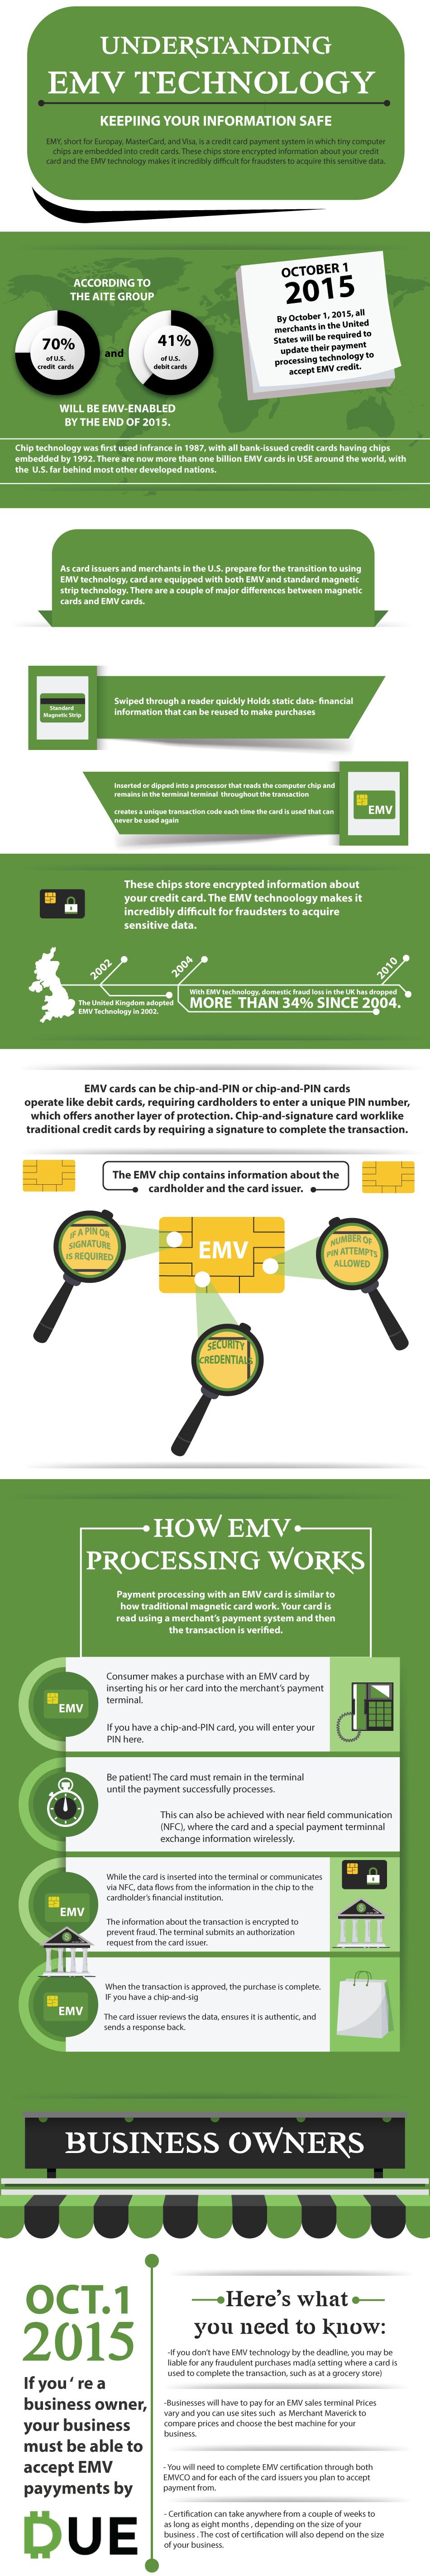 Understanding EMV Technology